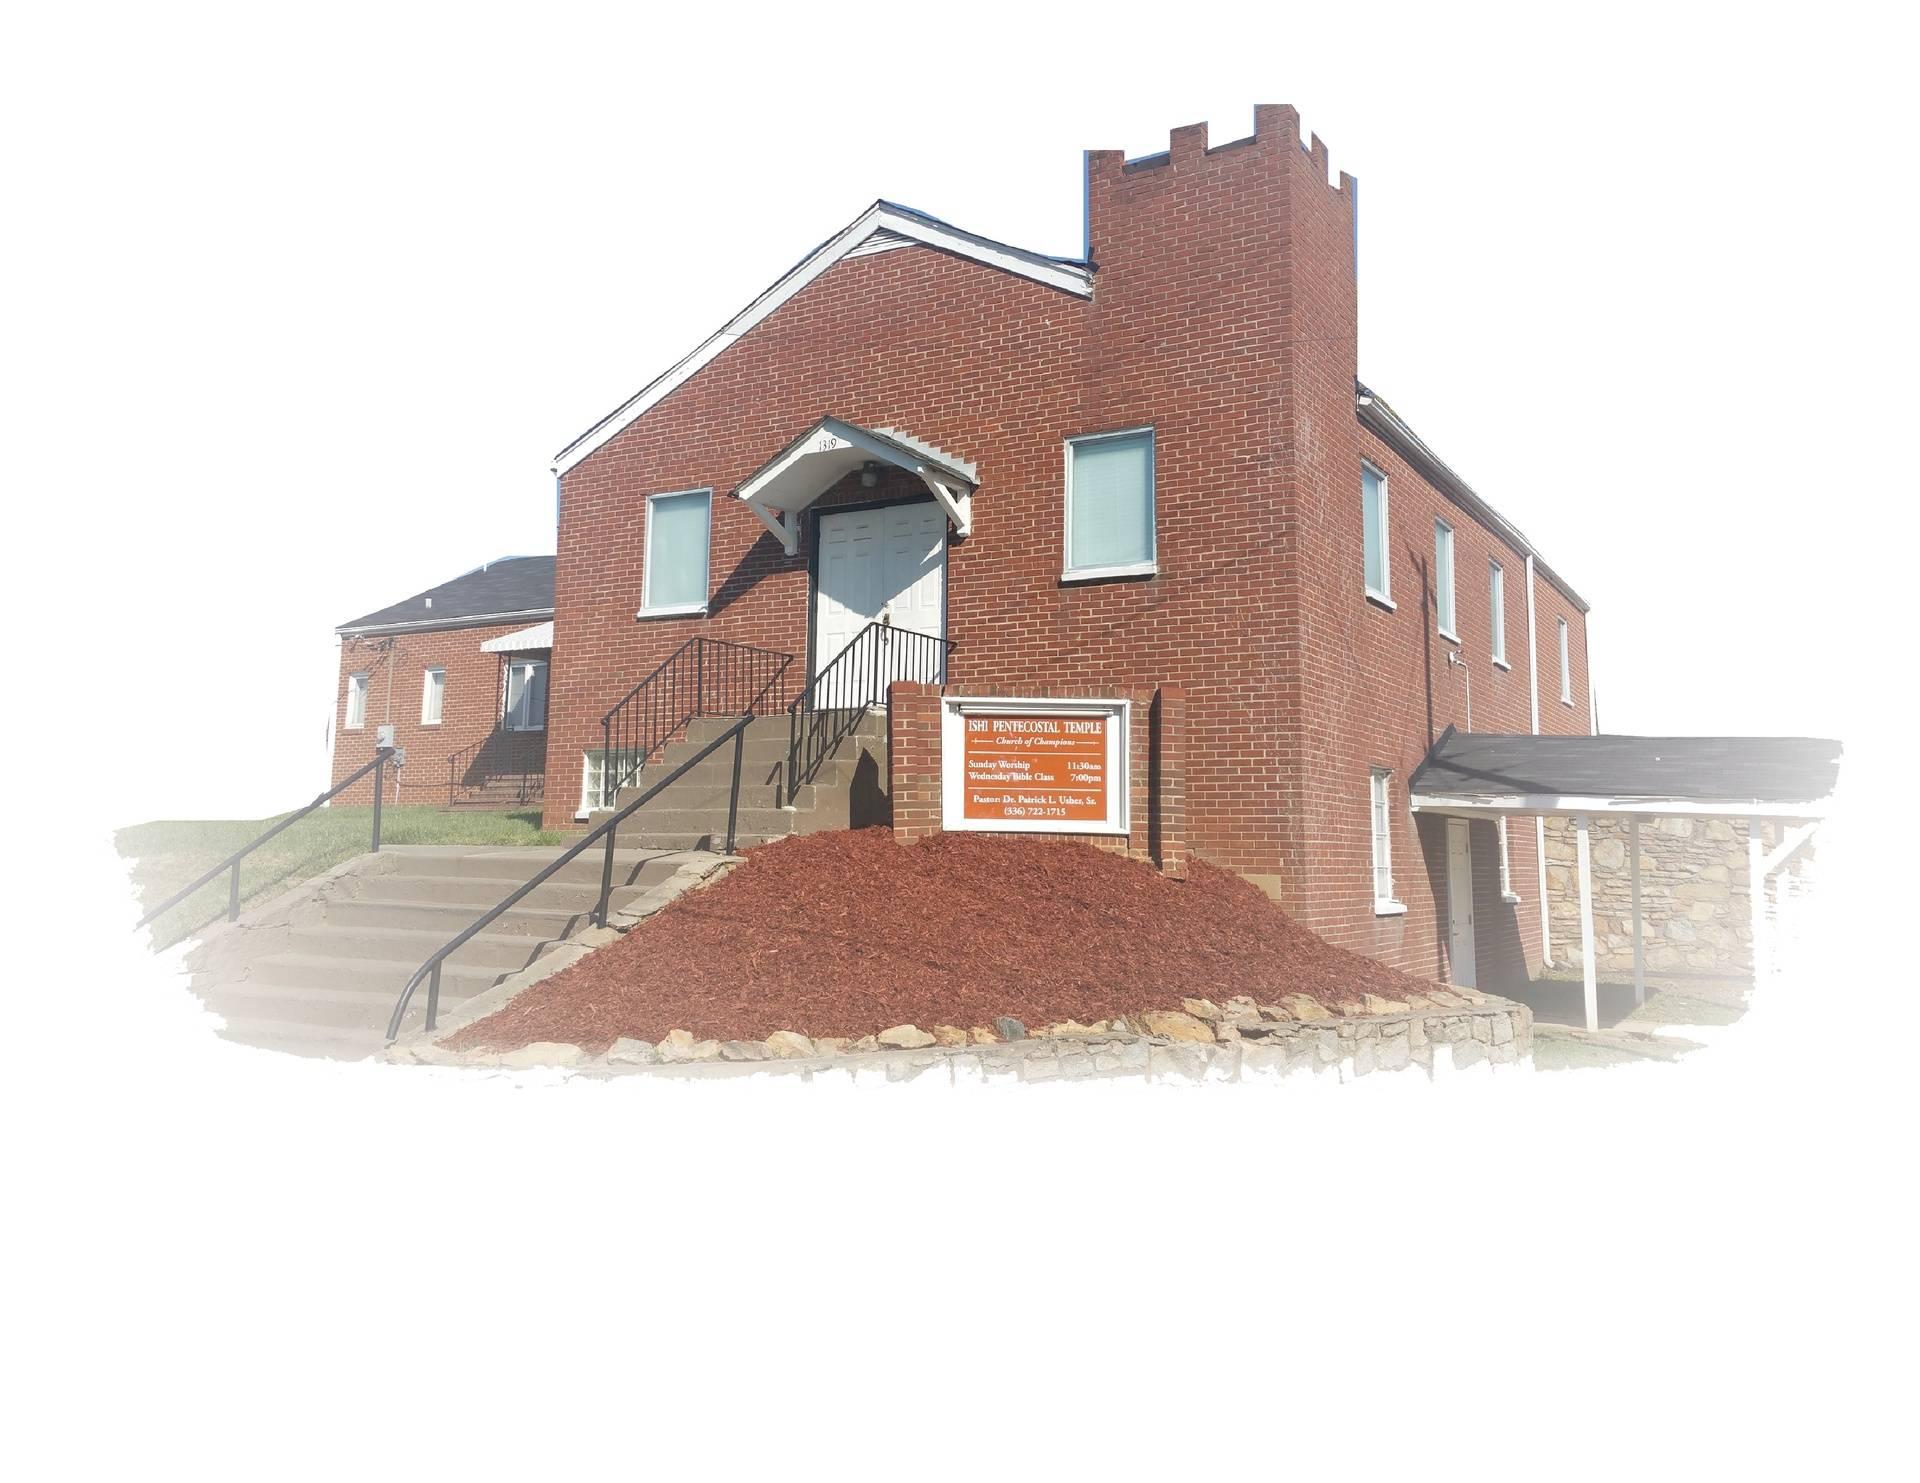 Ishi Pentecostal Temple, 1319 Excelsior St, Winston Salem, NC - US, 27101, United States